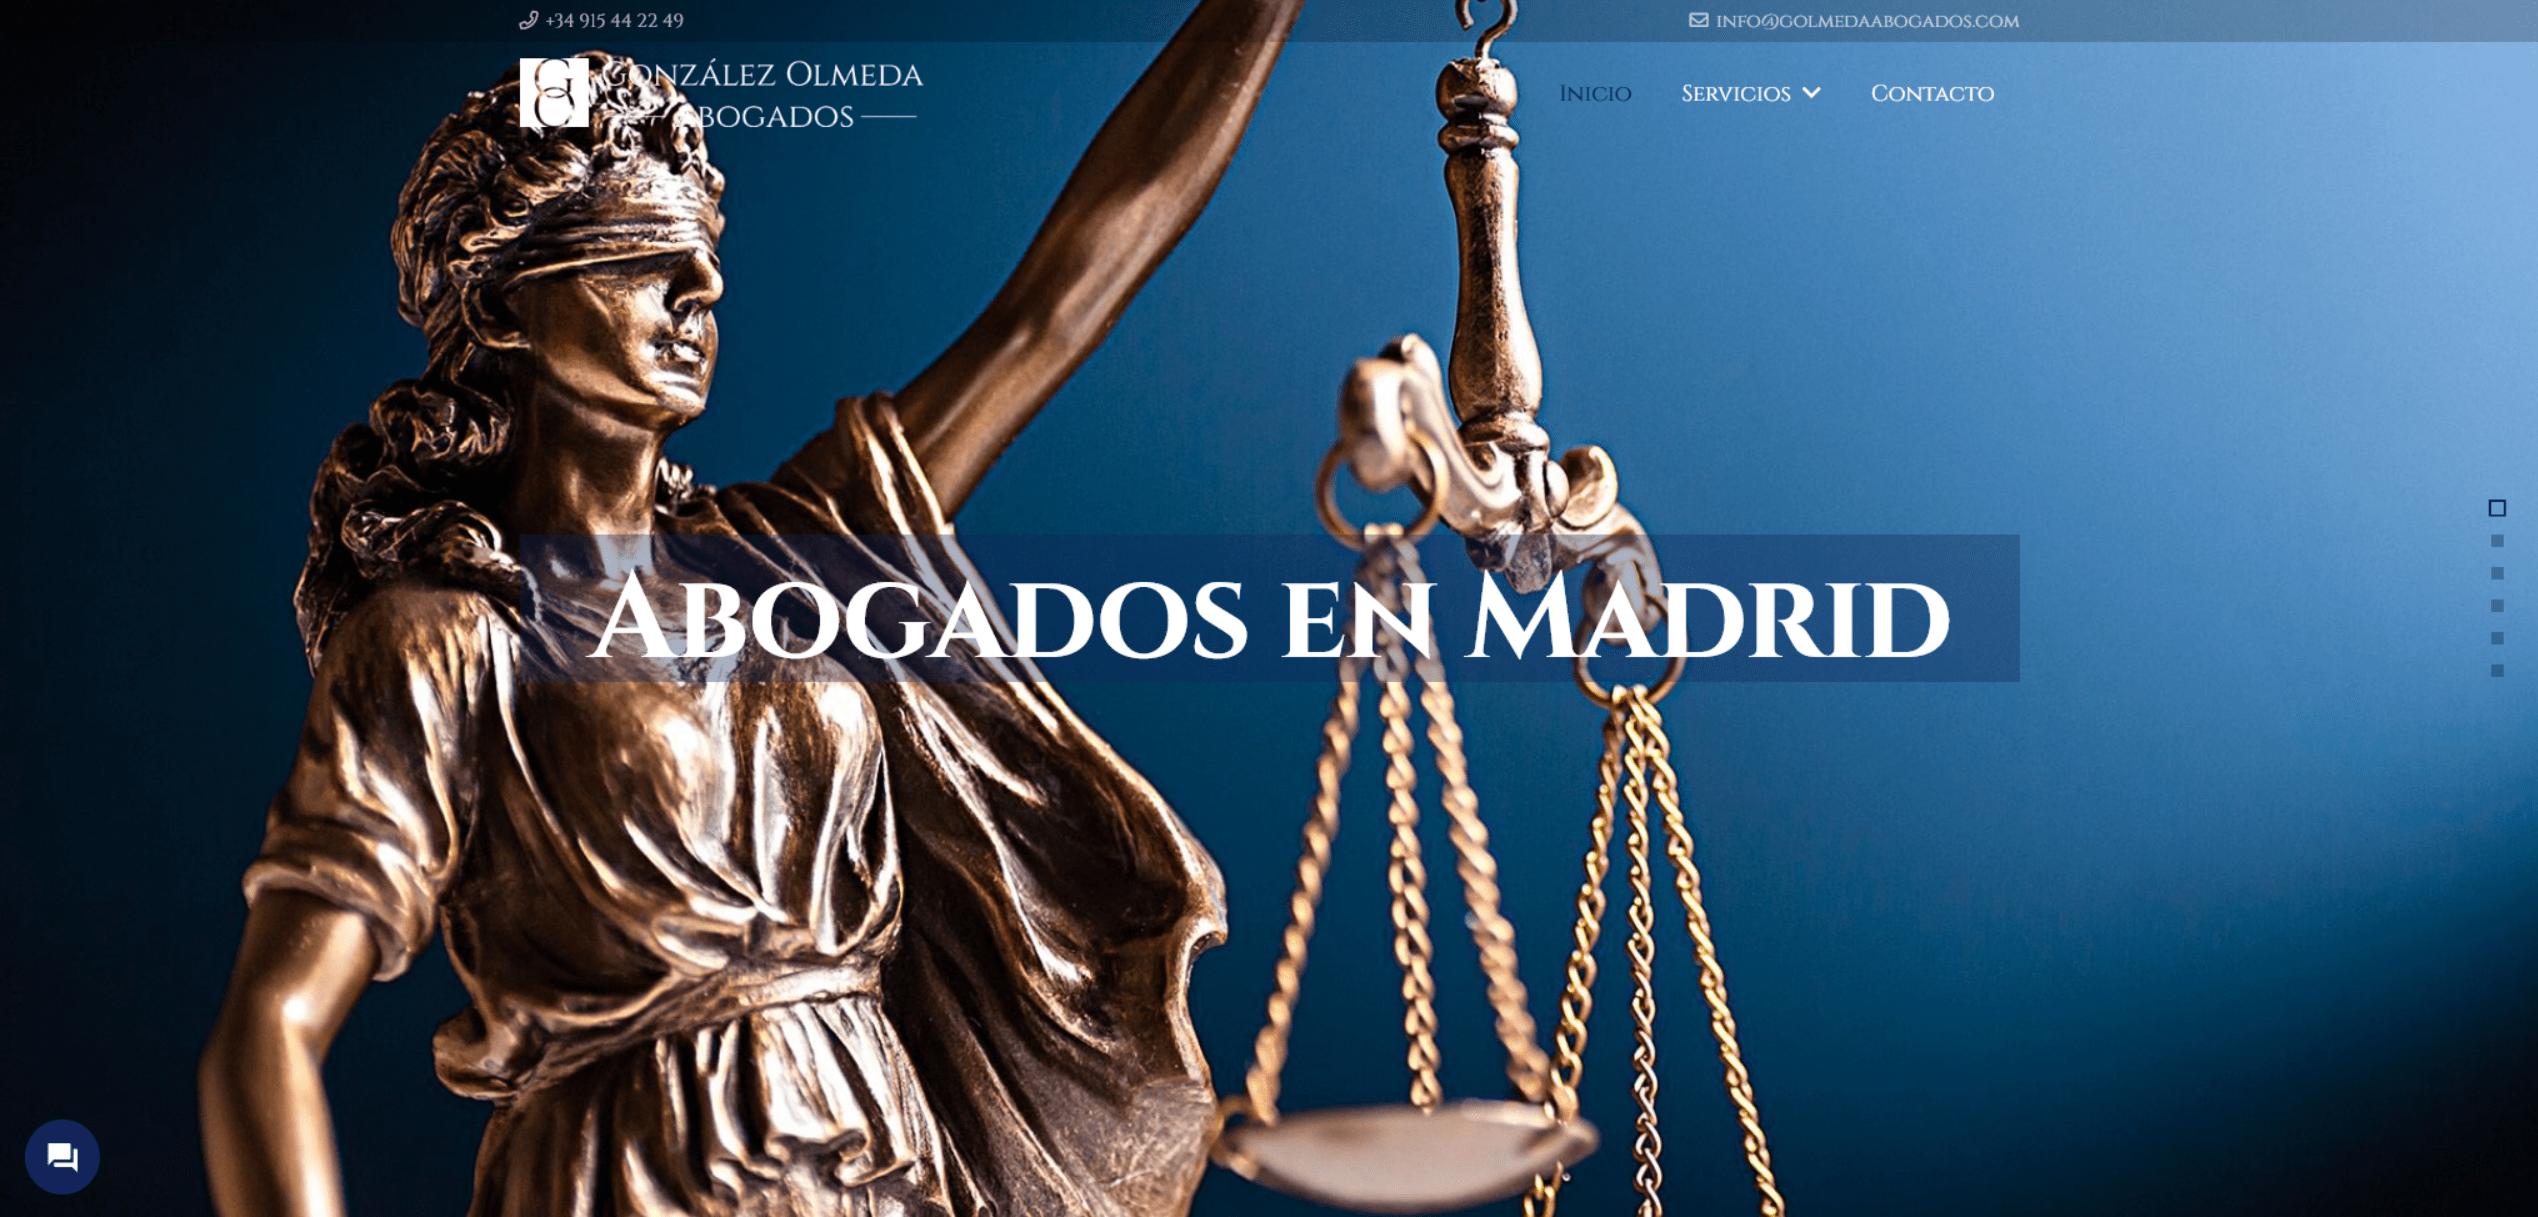 Golmeda Abogados - Abogados en Madrid